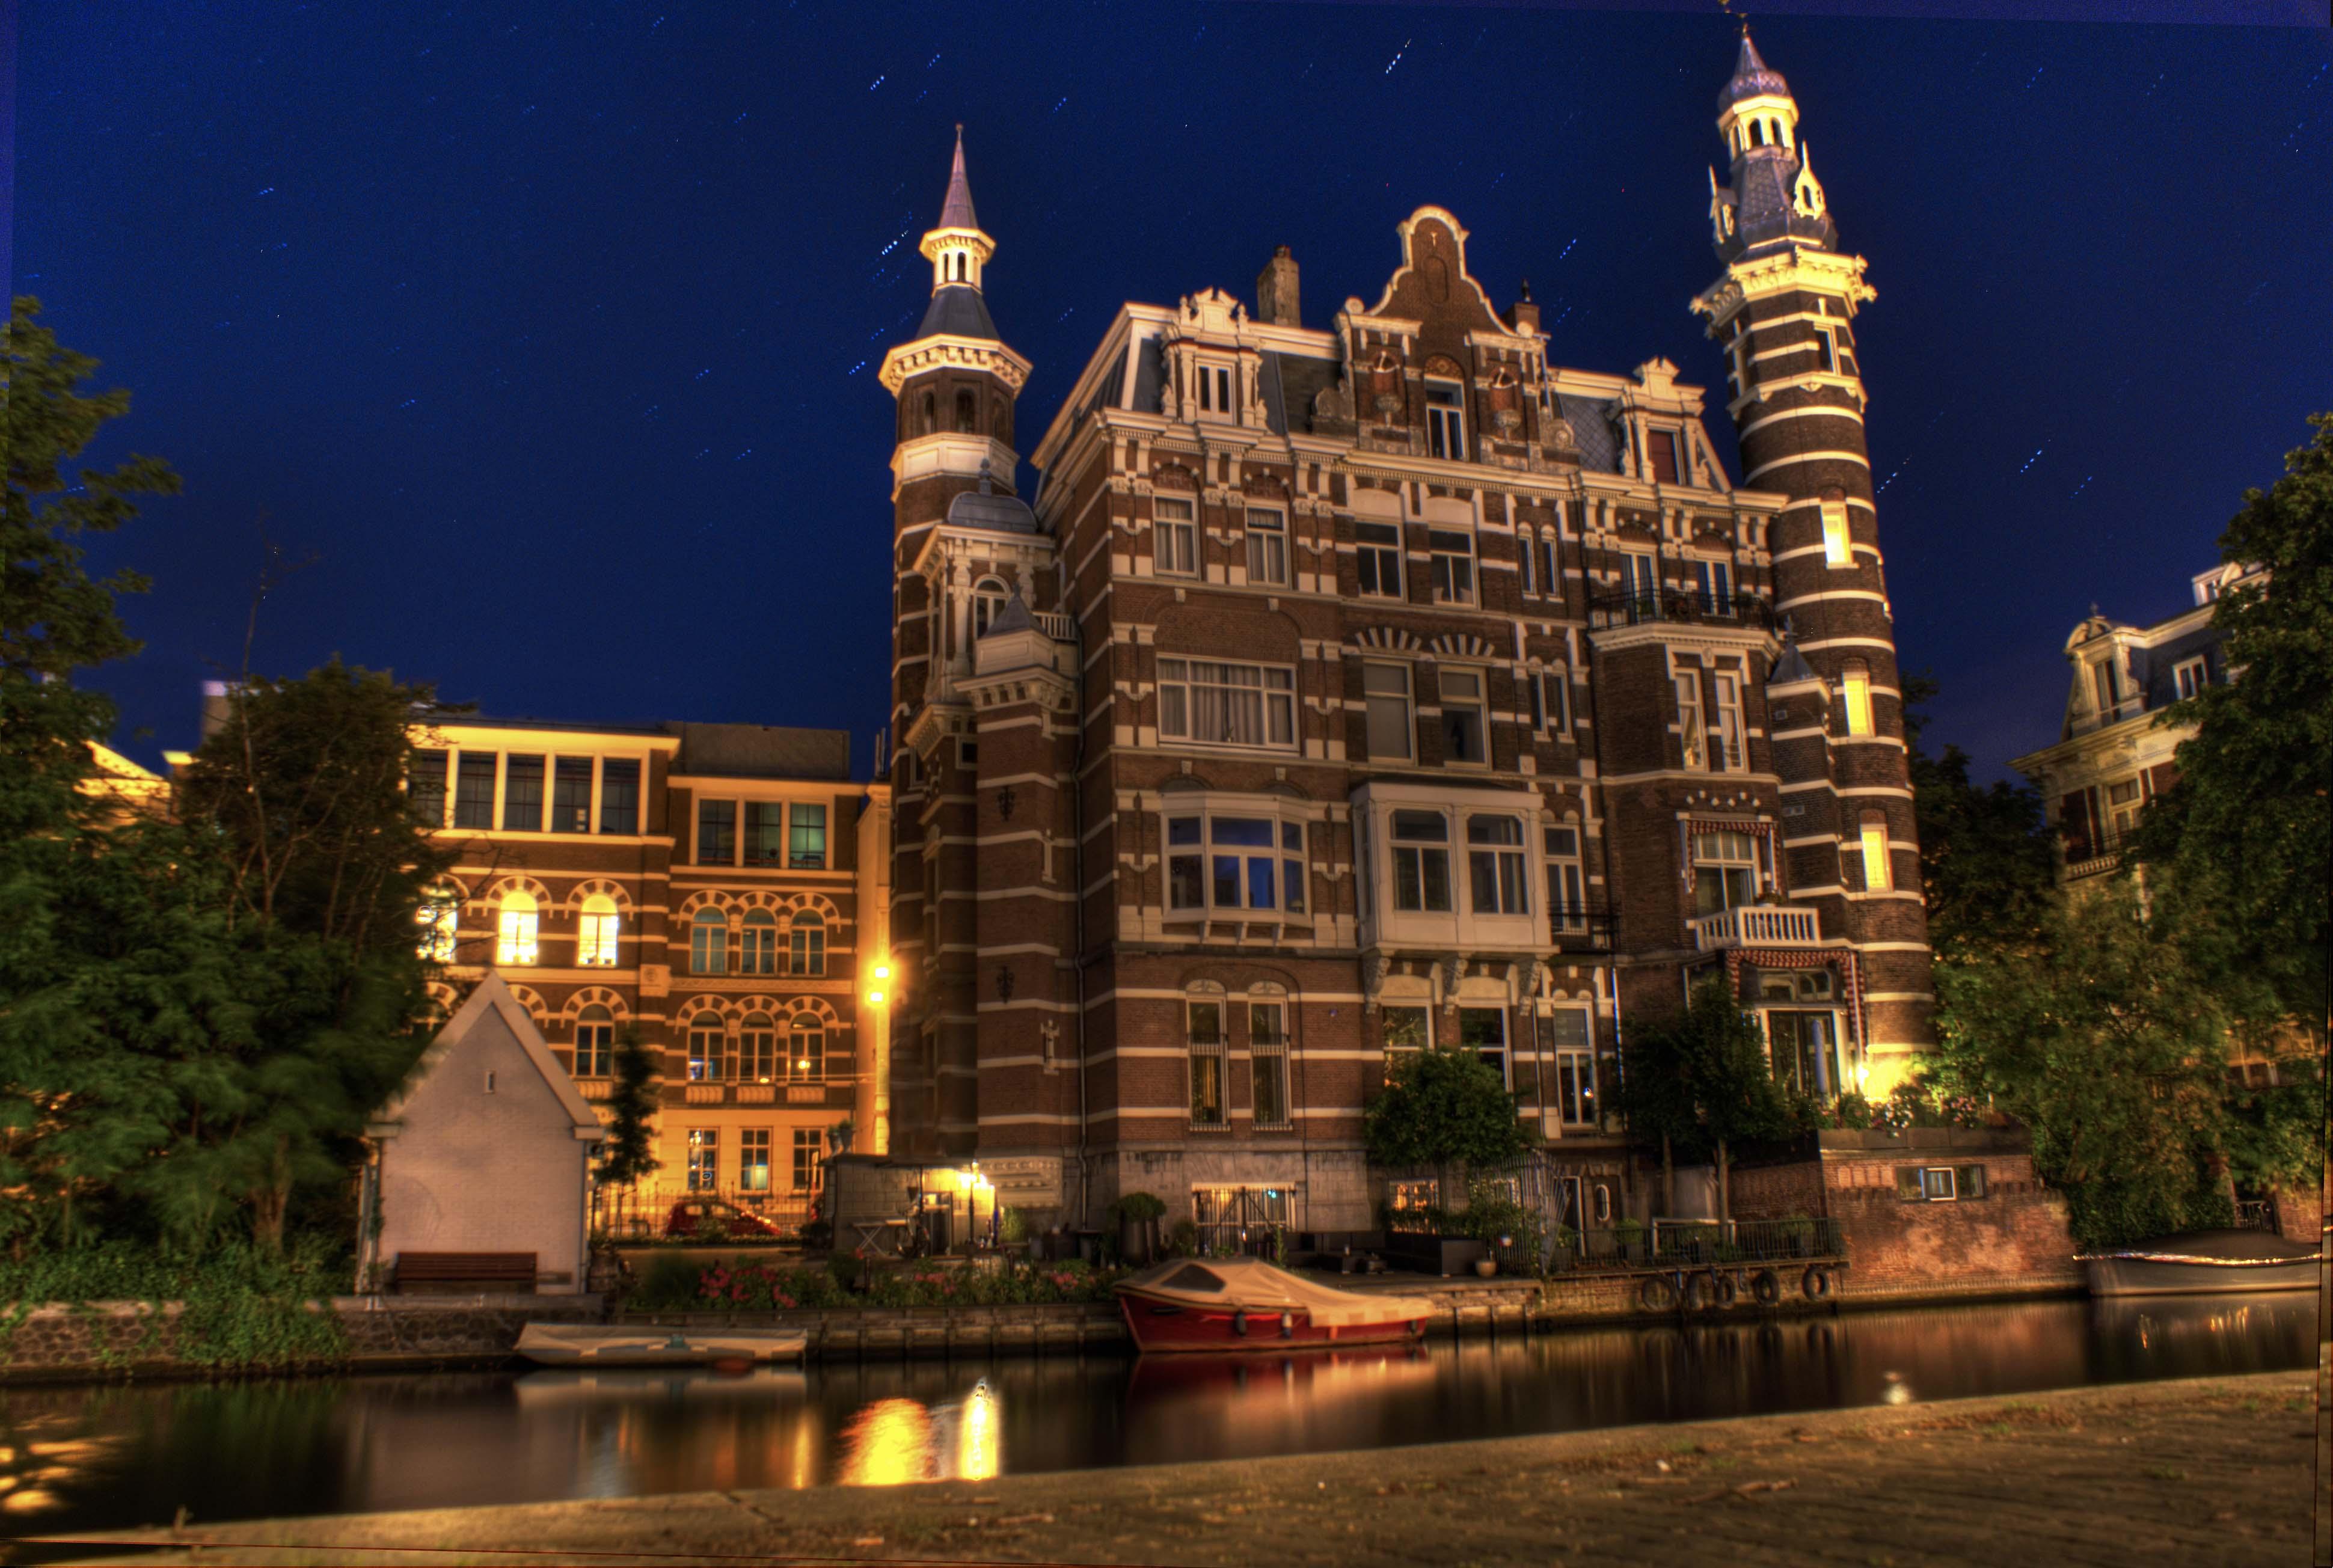 Midnight Dazing in Amsterdam